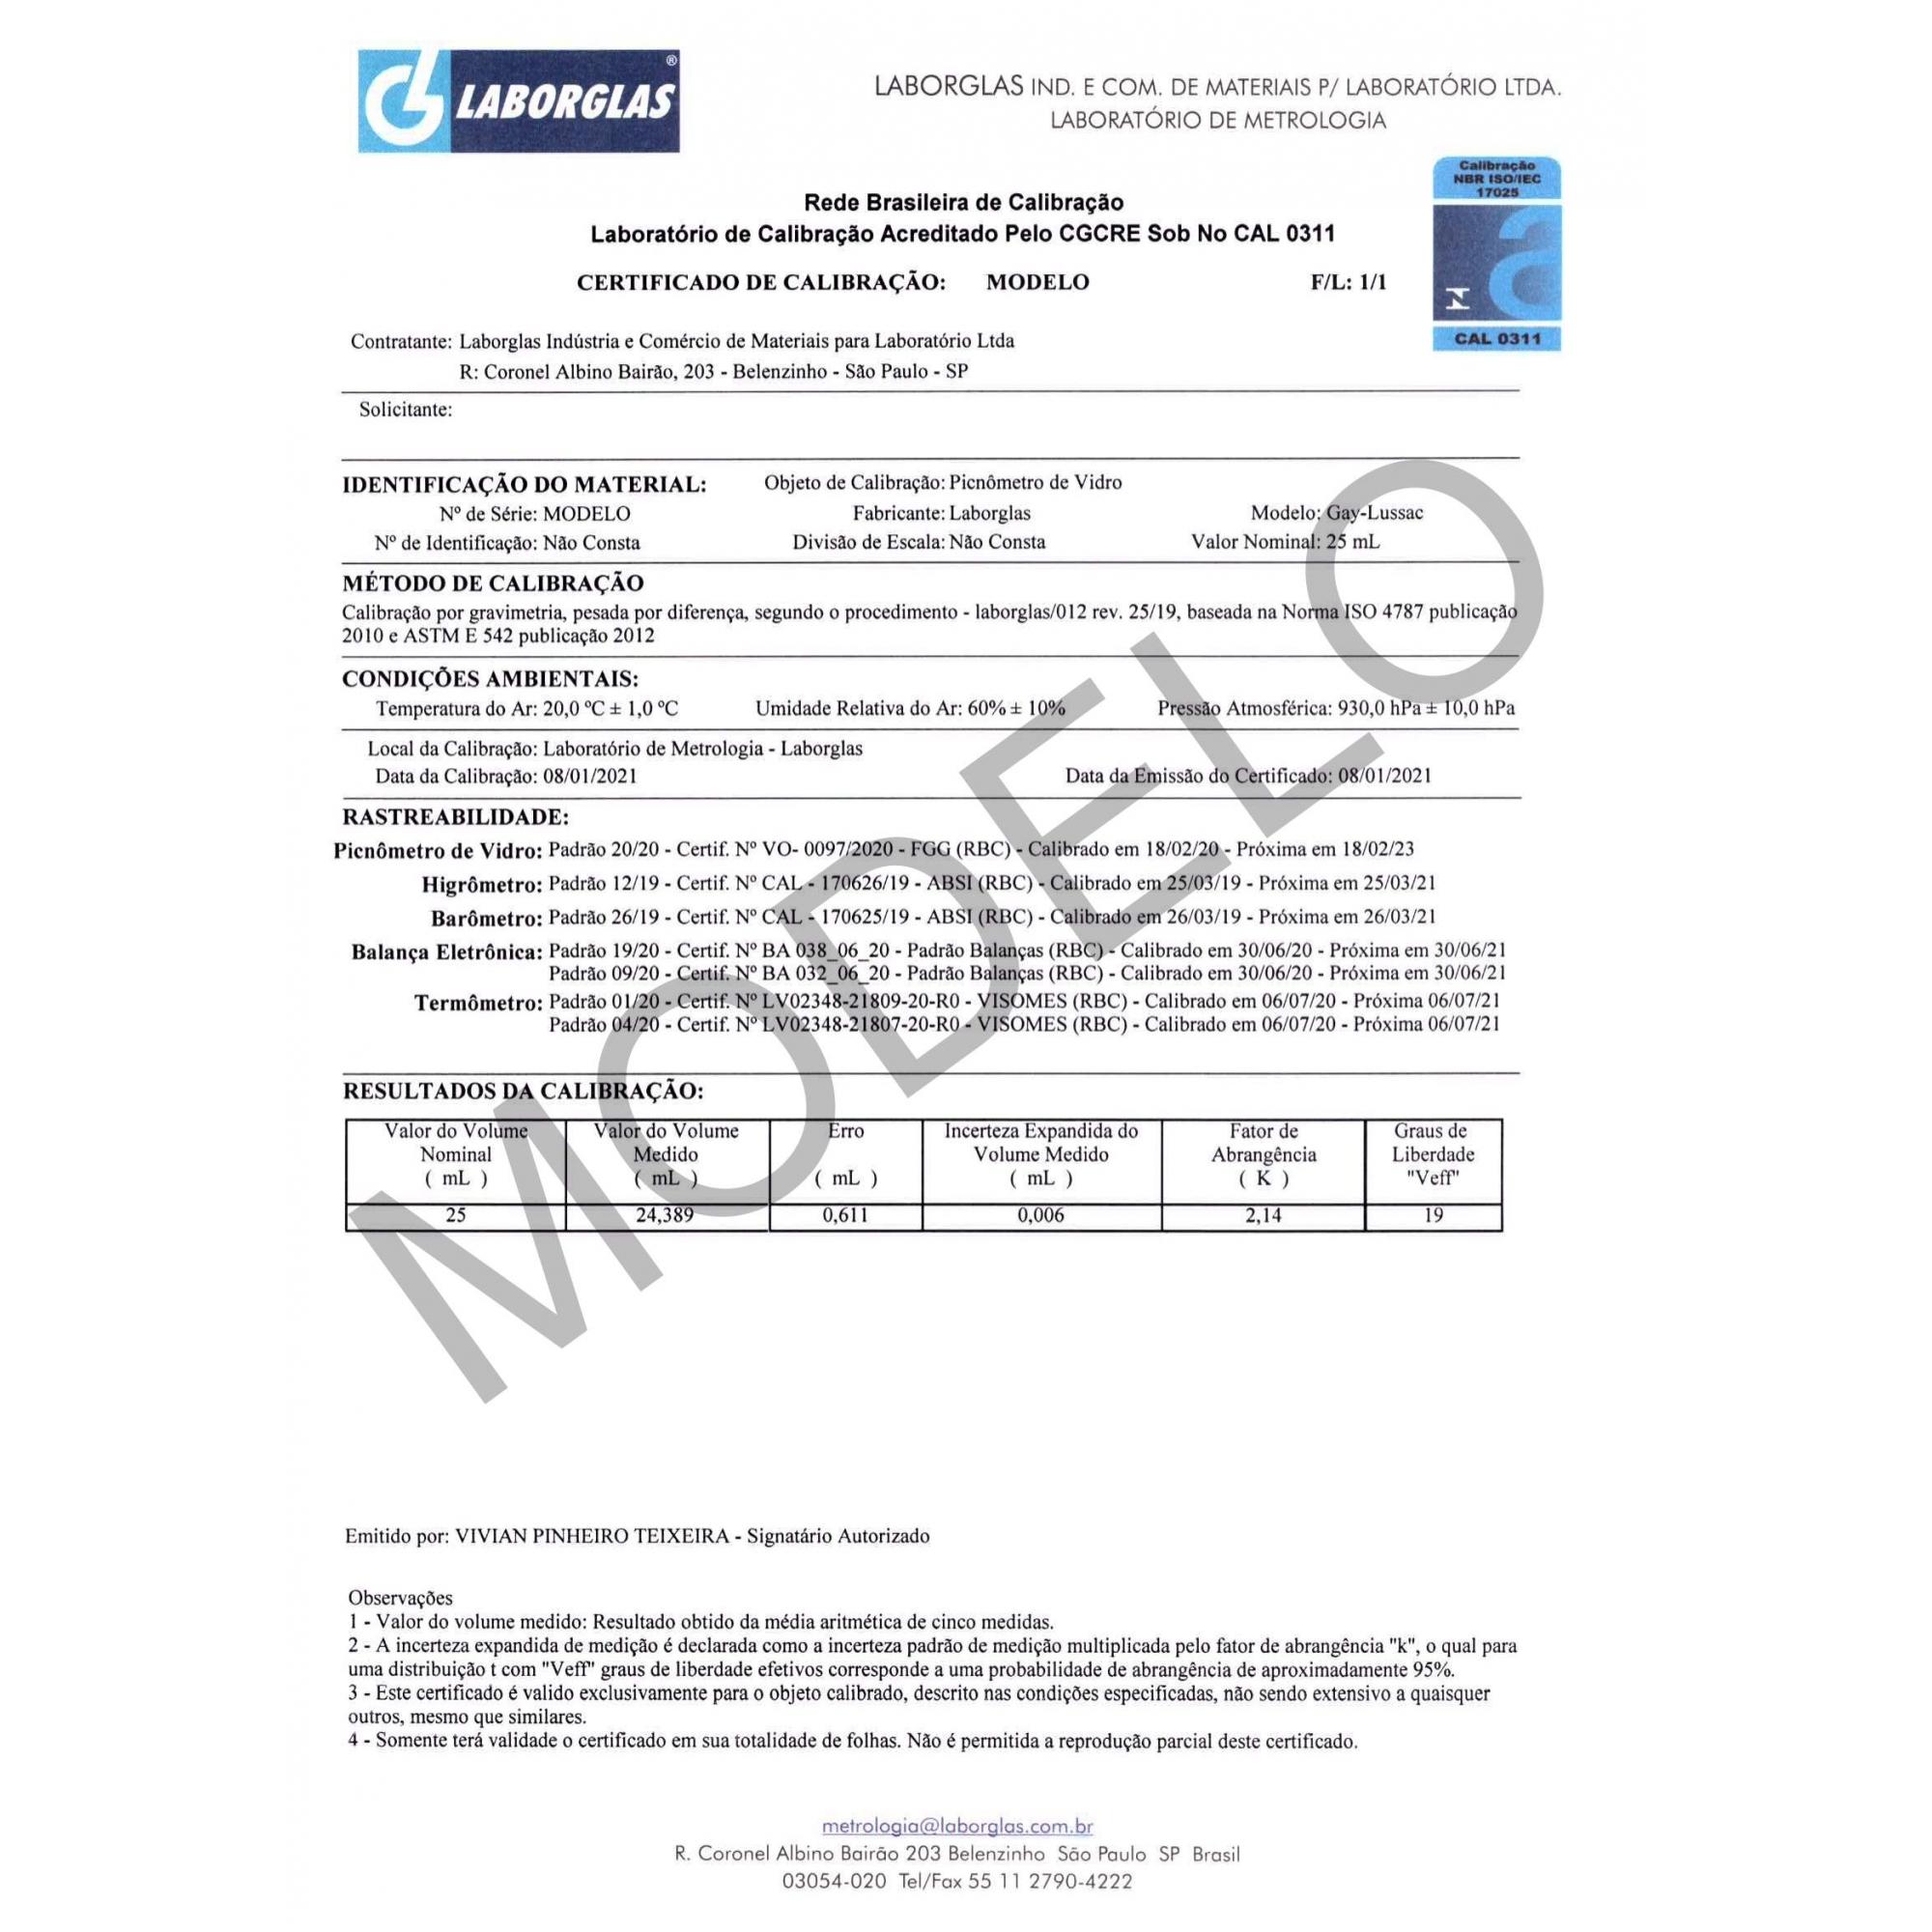 PICNÔMETRO GAY-LUSSAC SEM TERMÔMETRO 10 ML CERTIFICADO RBC - Laborglas - Cód. 9491108-R